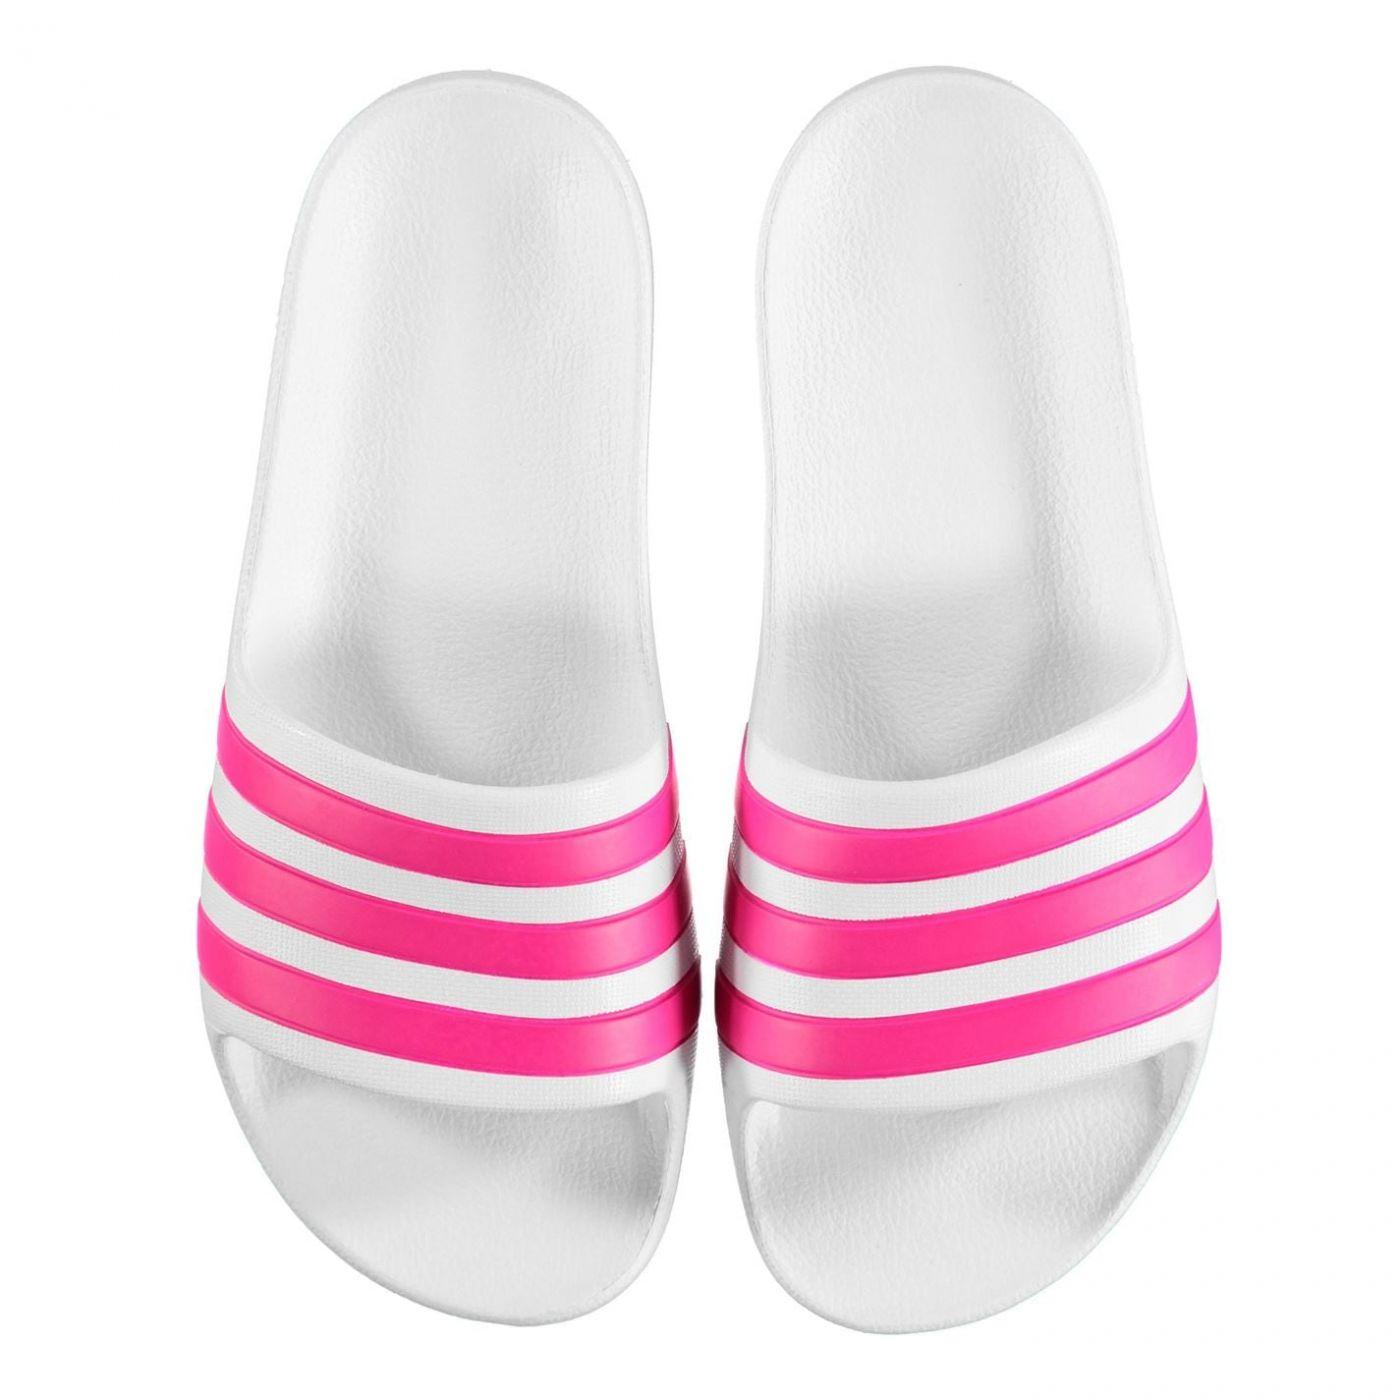 Adidas Duramo Sliders Junior Girls